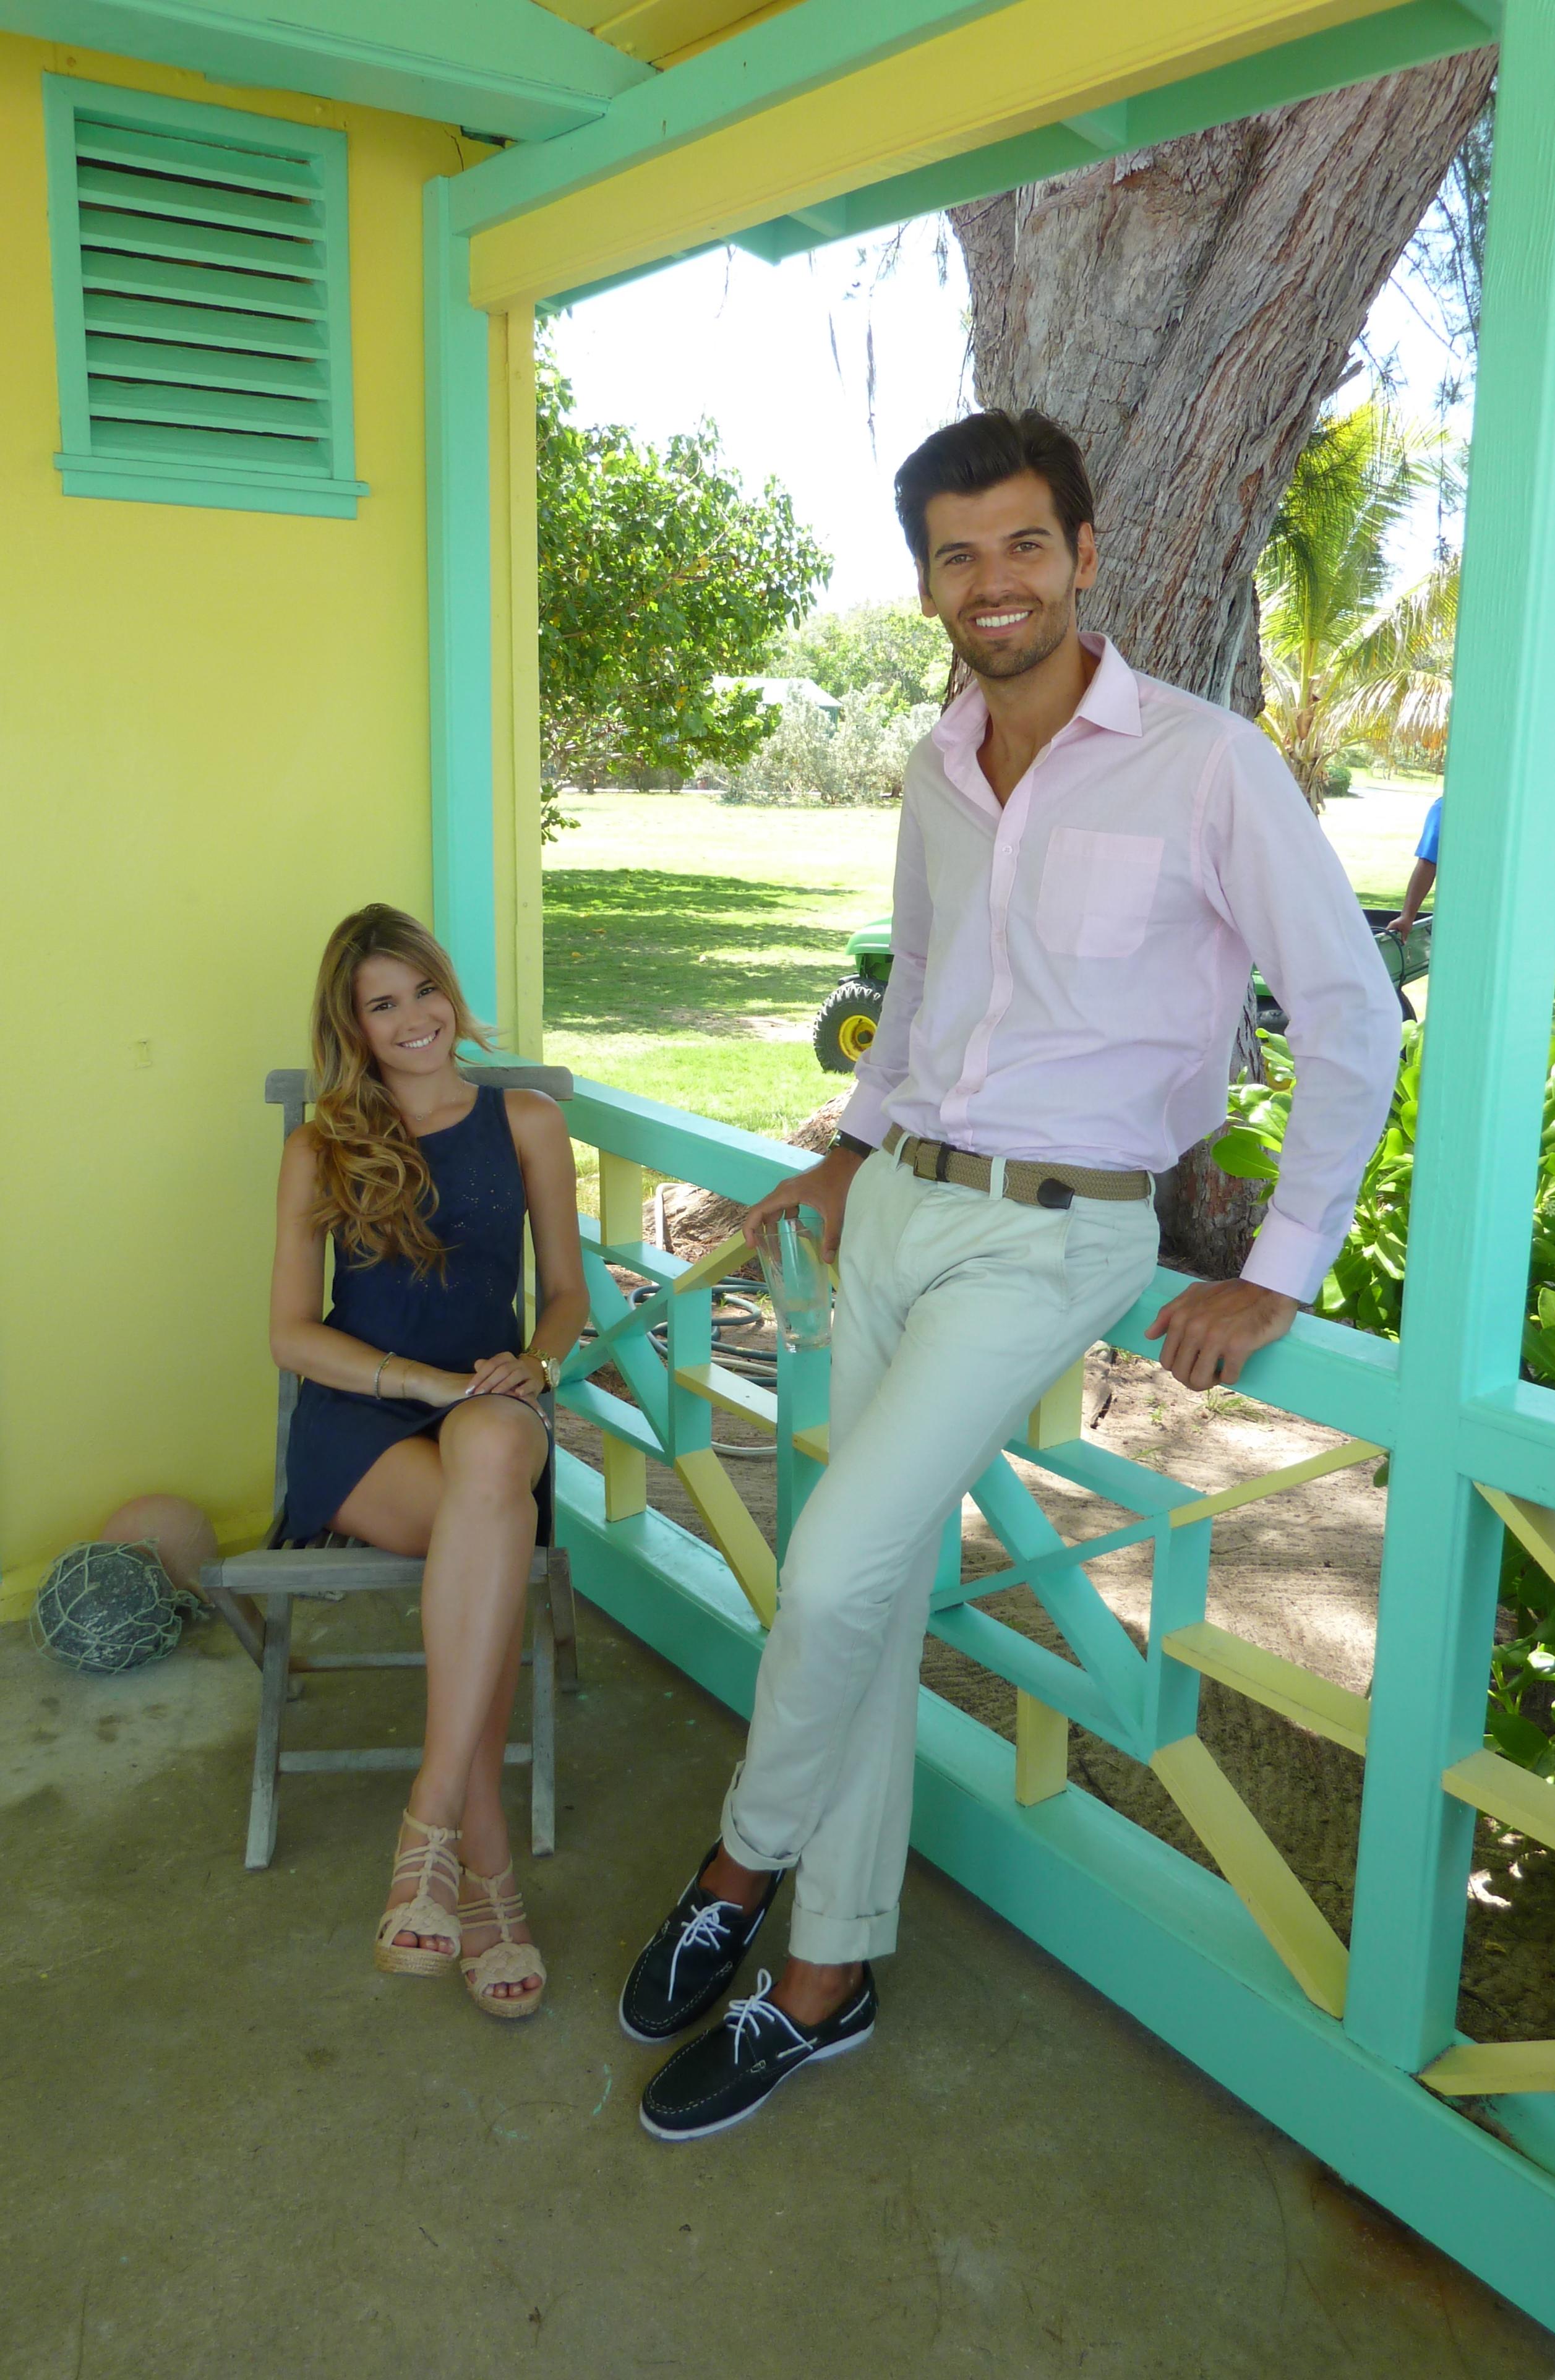 Cindy and Brad